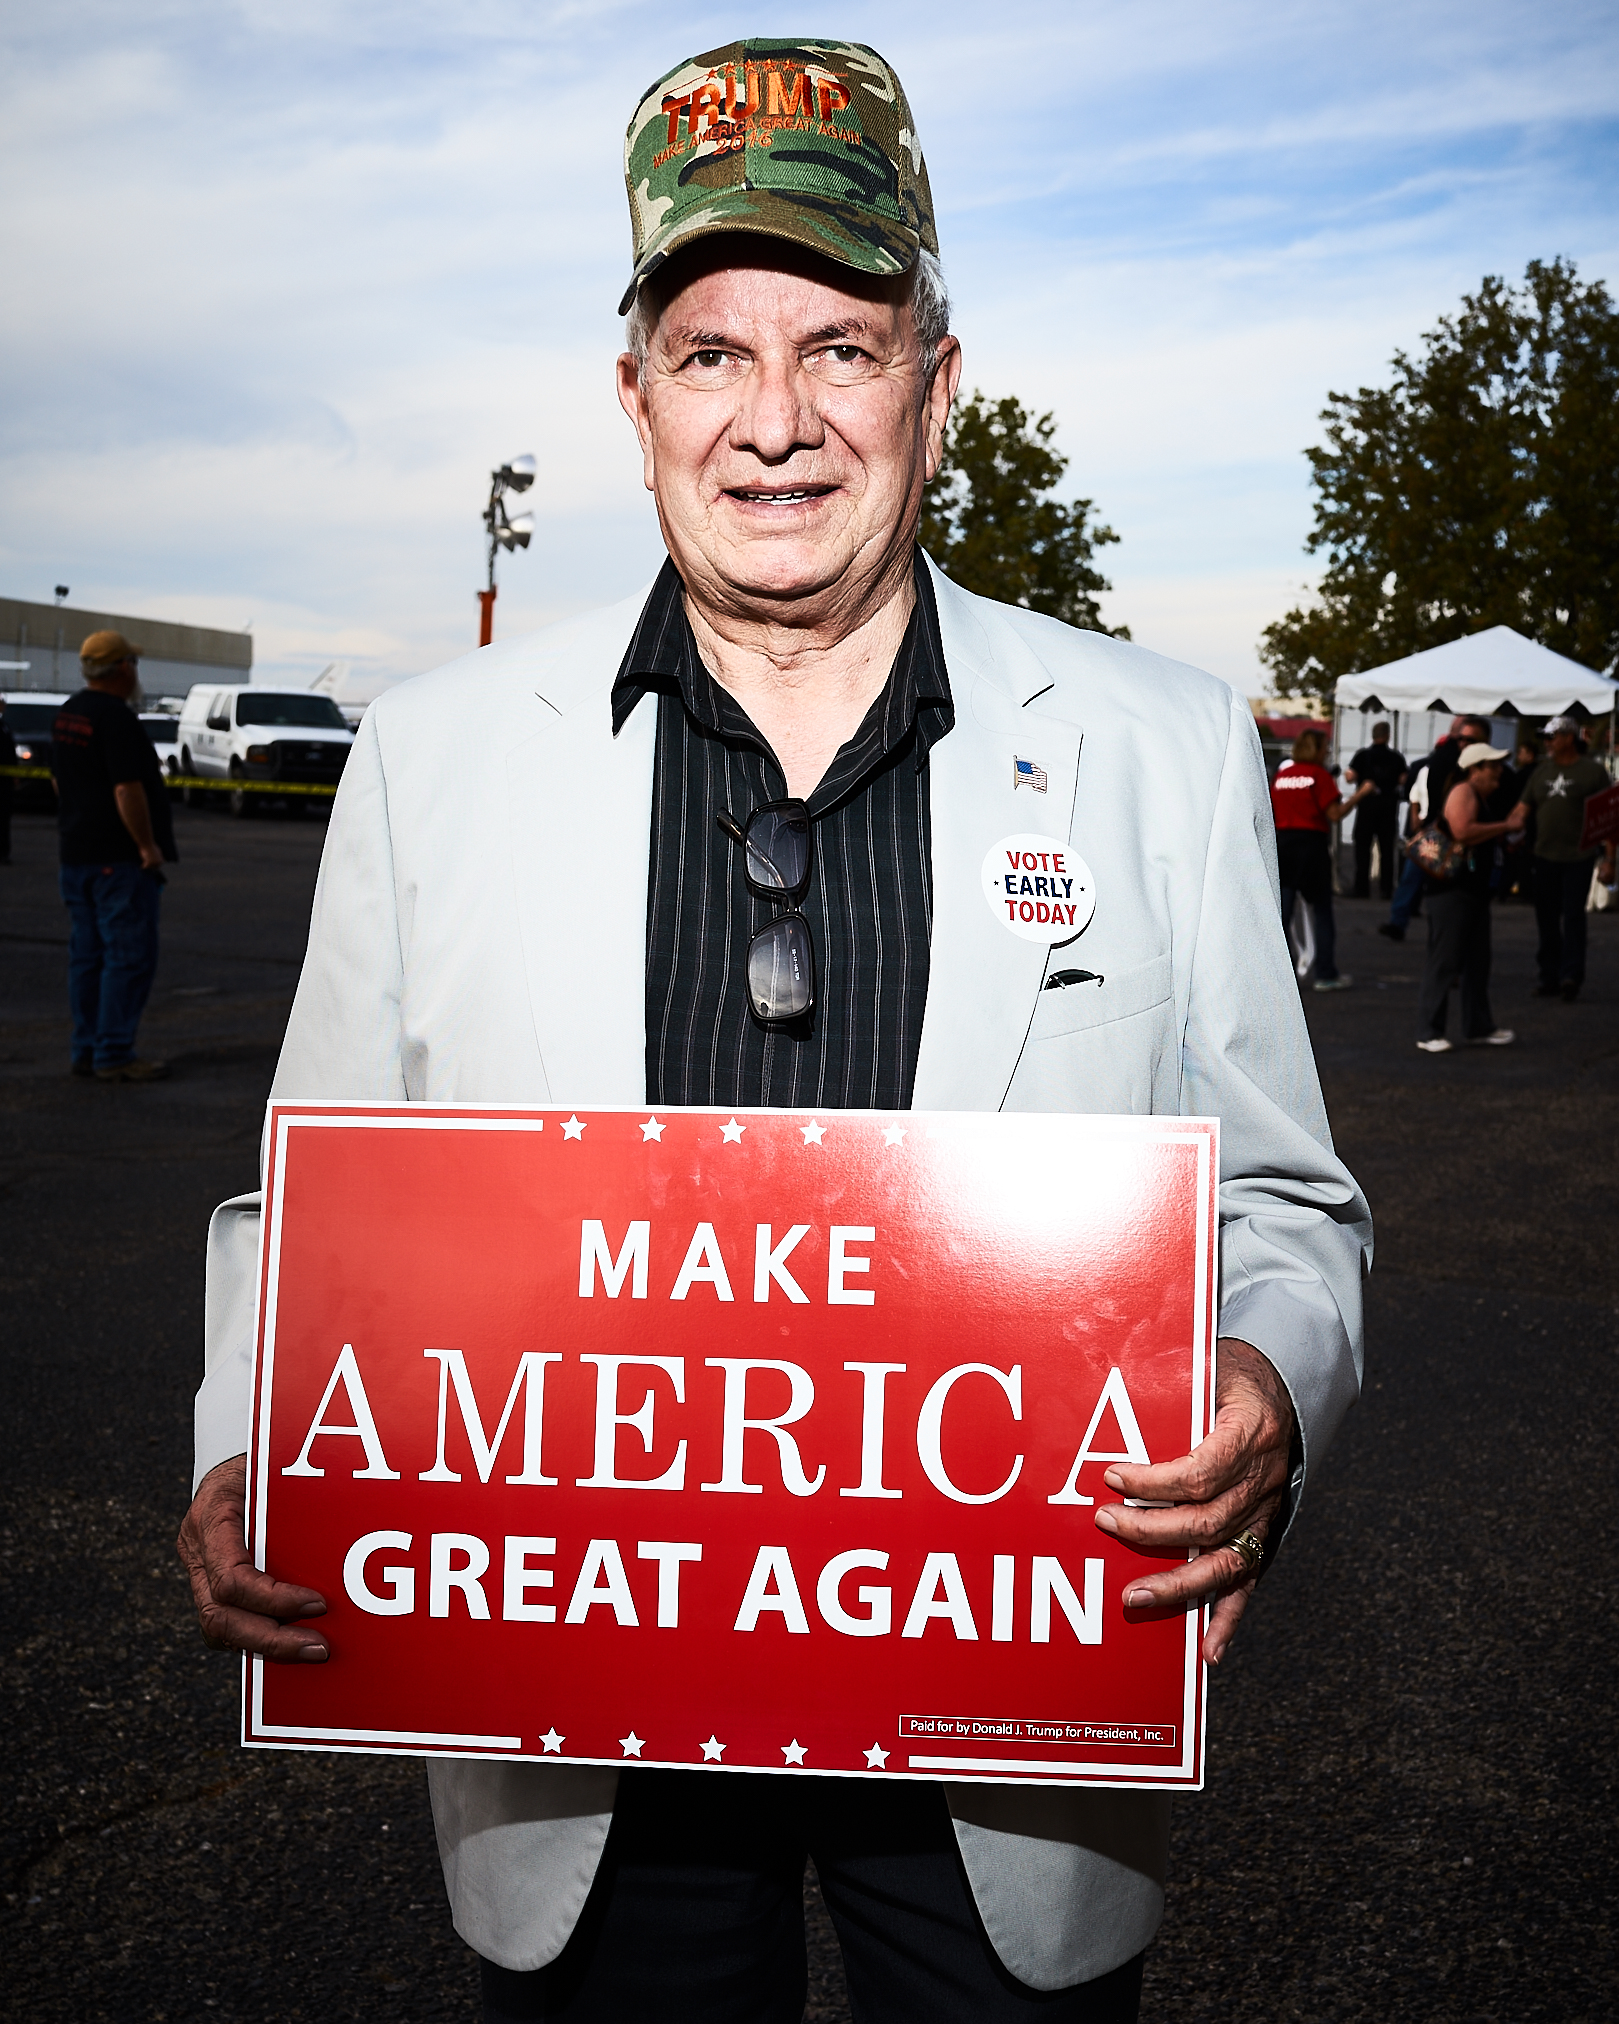 Make America Great Again by Peter Adams.